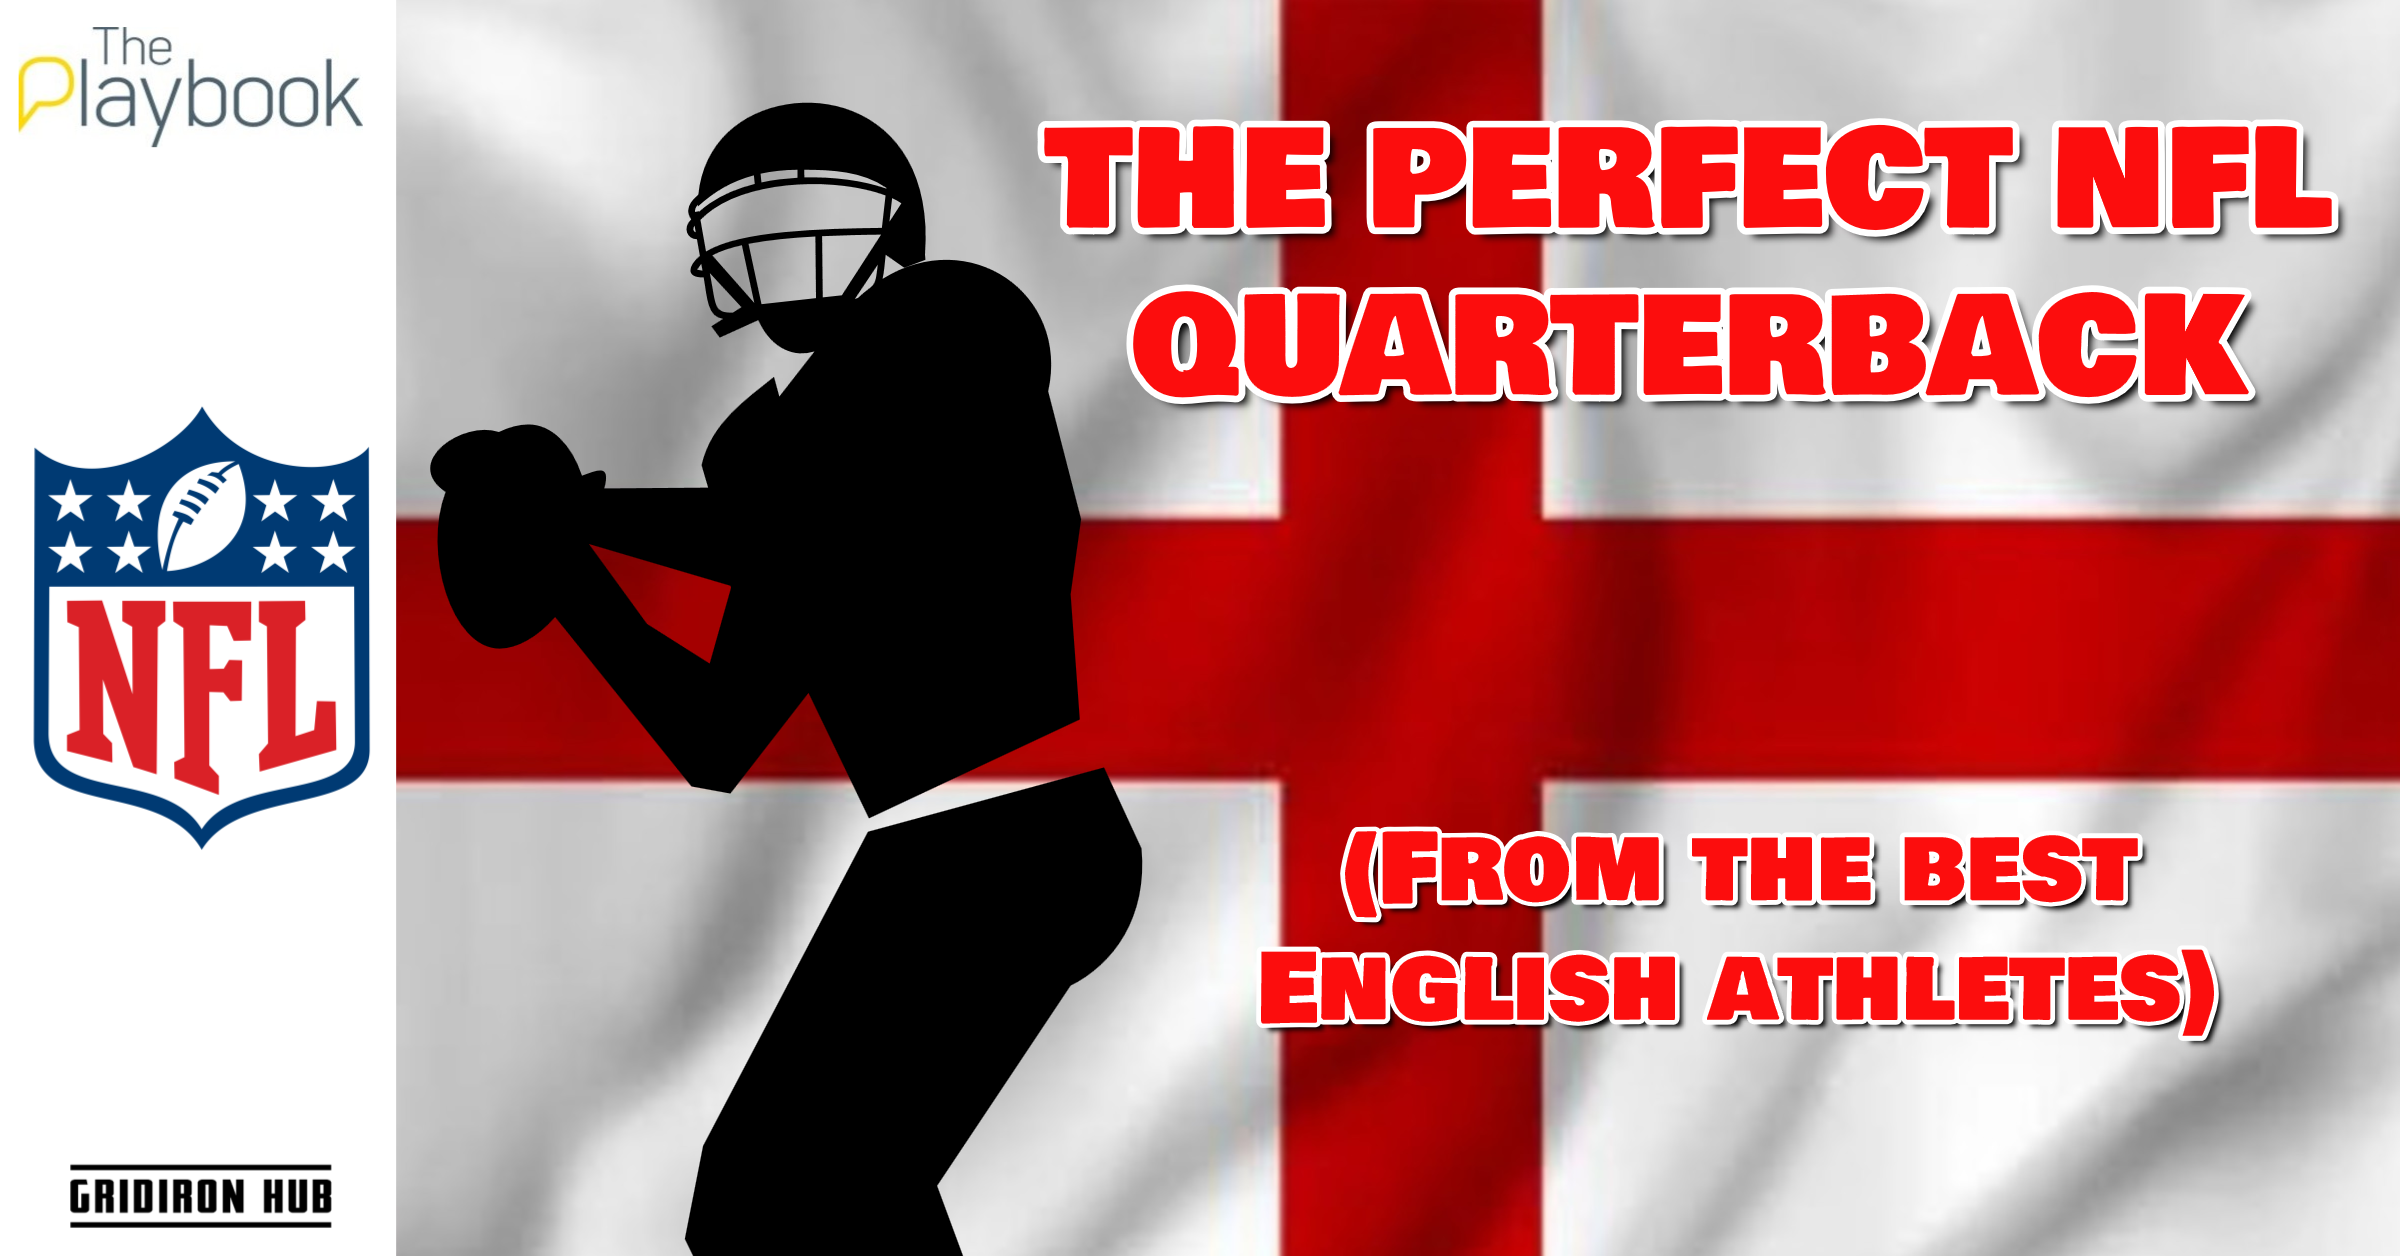 THE PERFECT NFL QUARTERBACK - Gridiron Hub